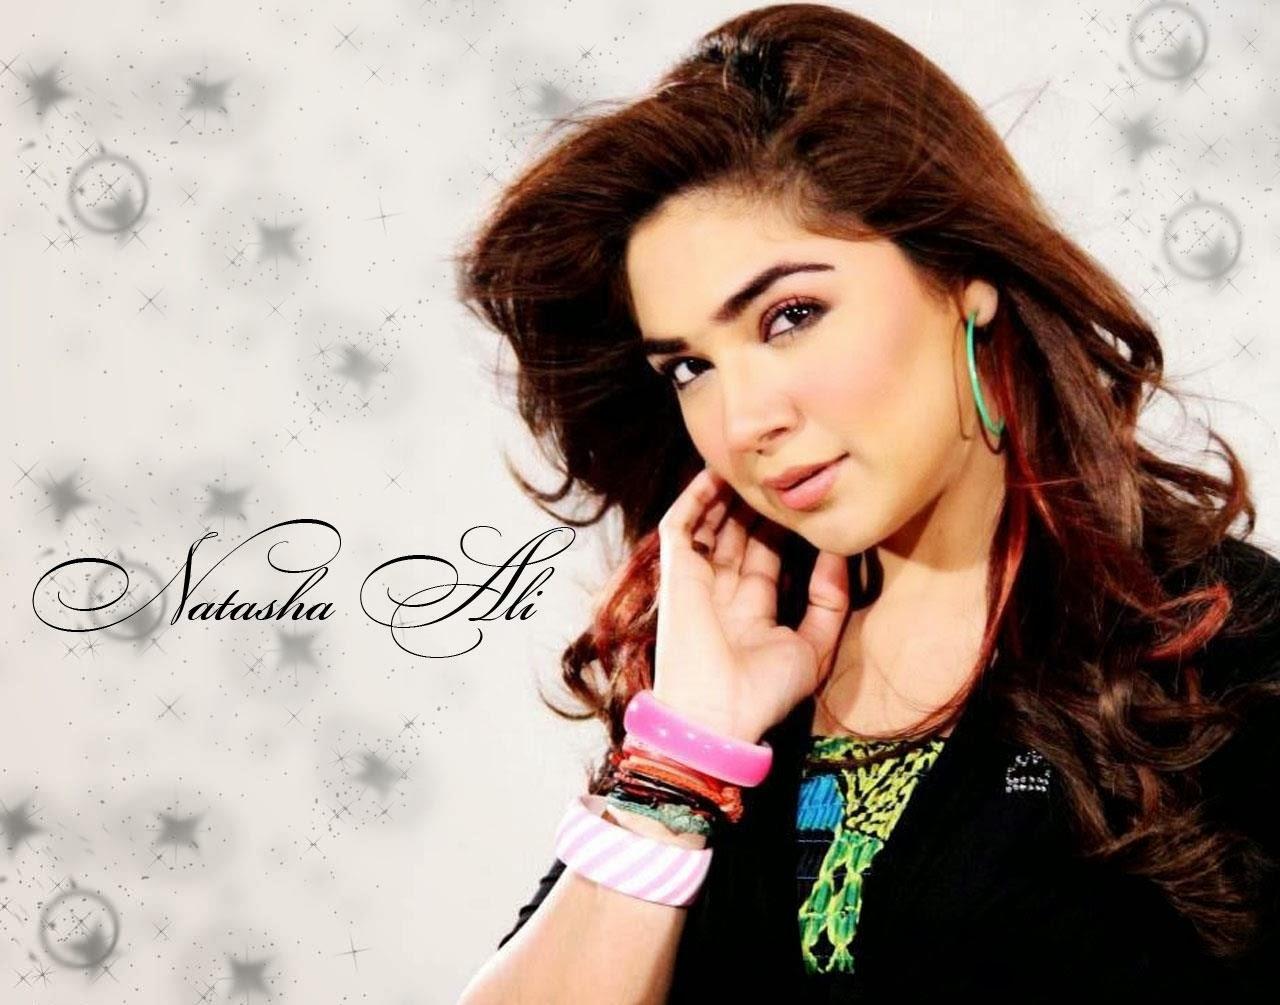 Natasha Ali HD Wallpapers Free Download